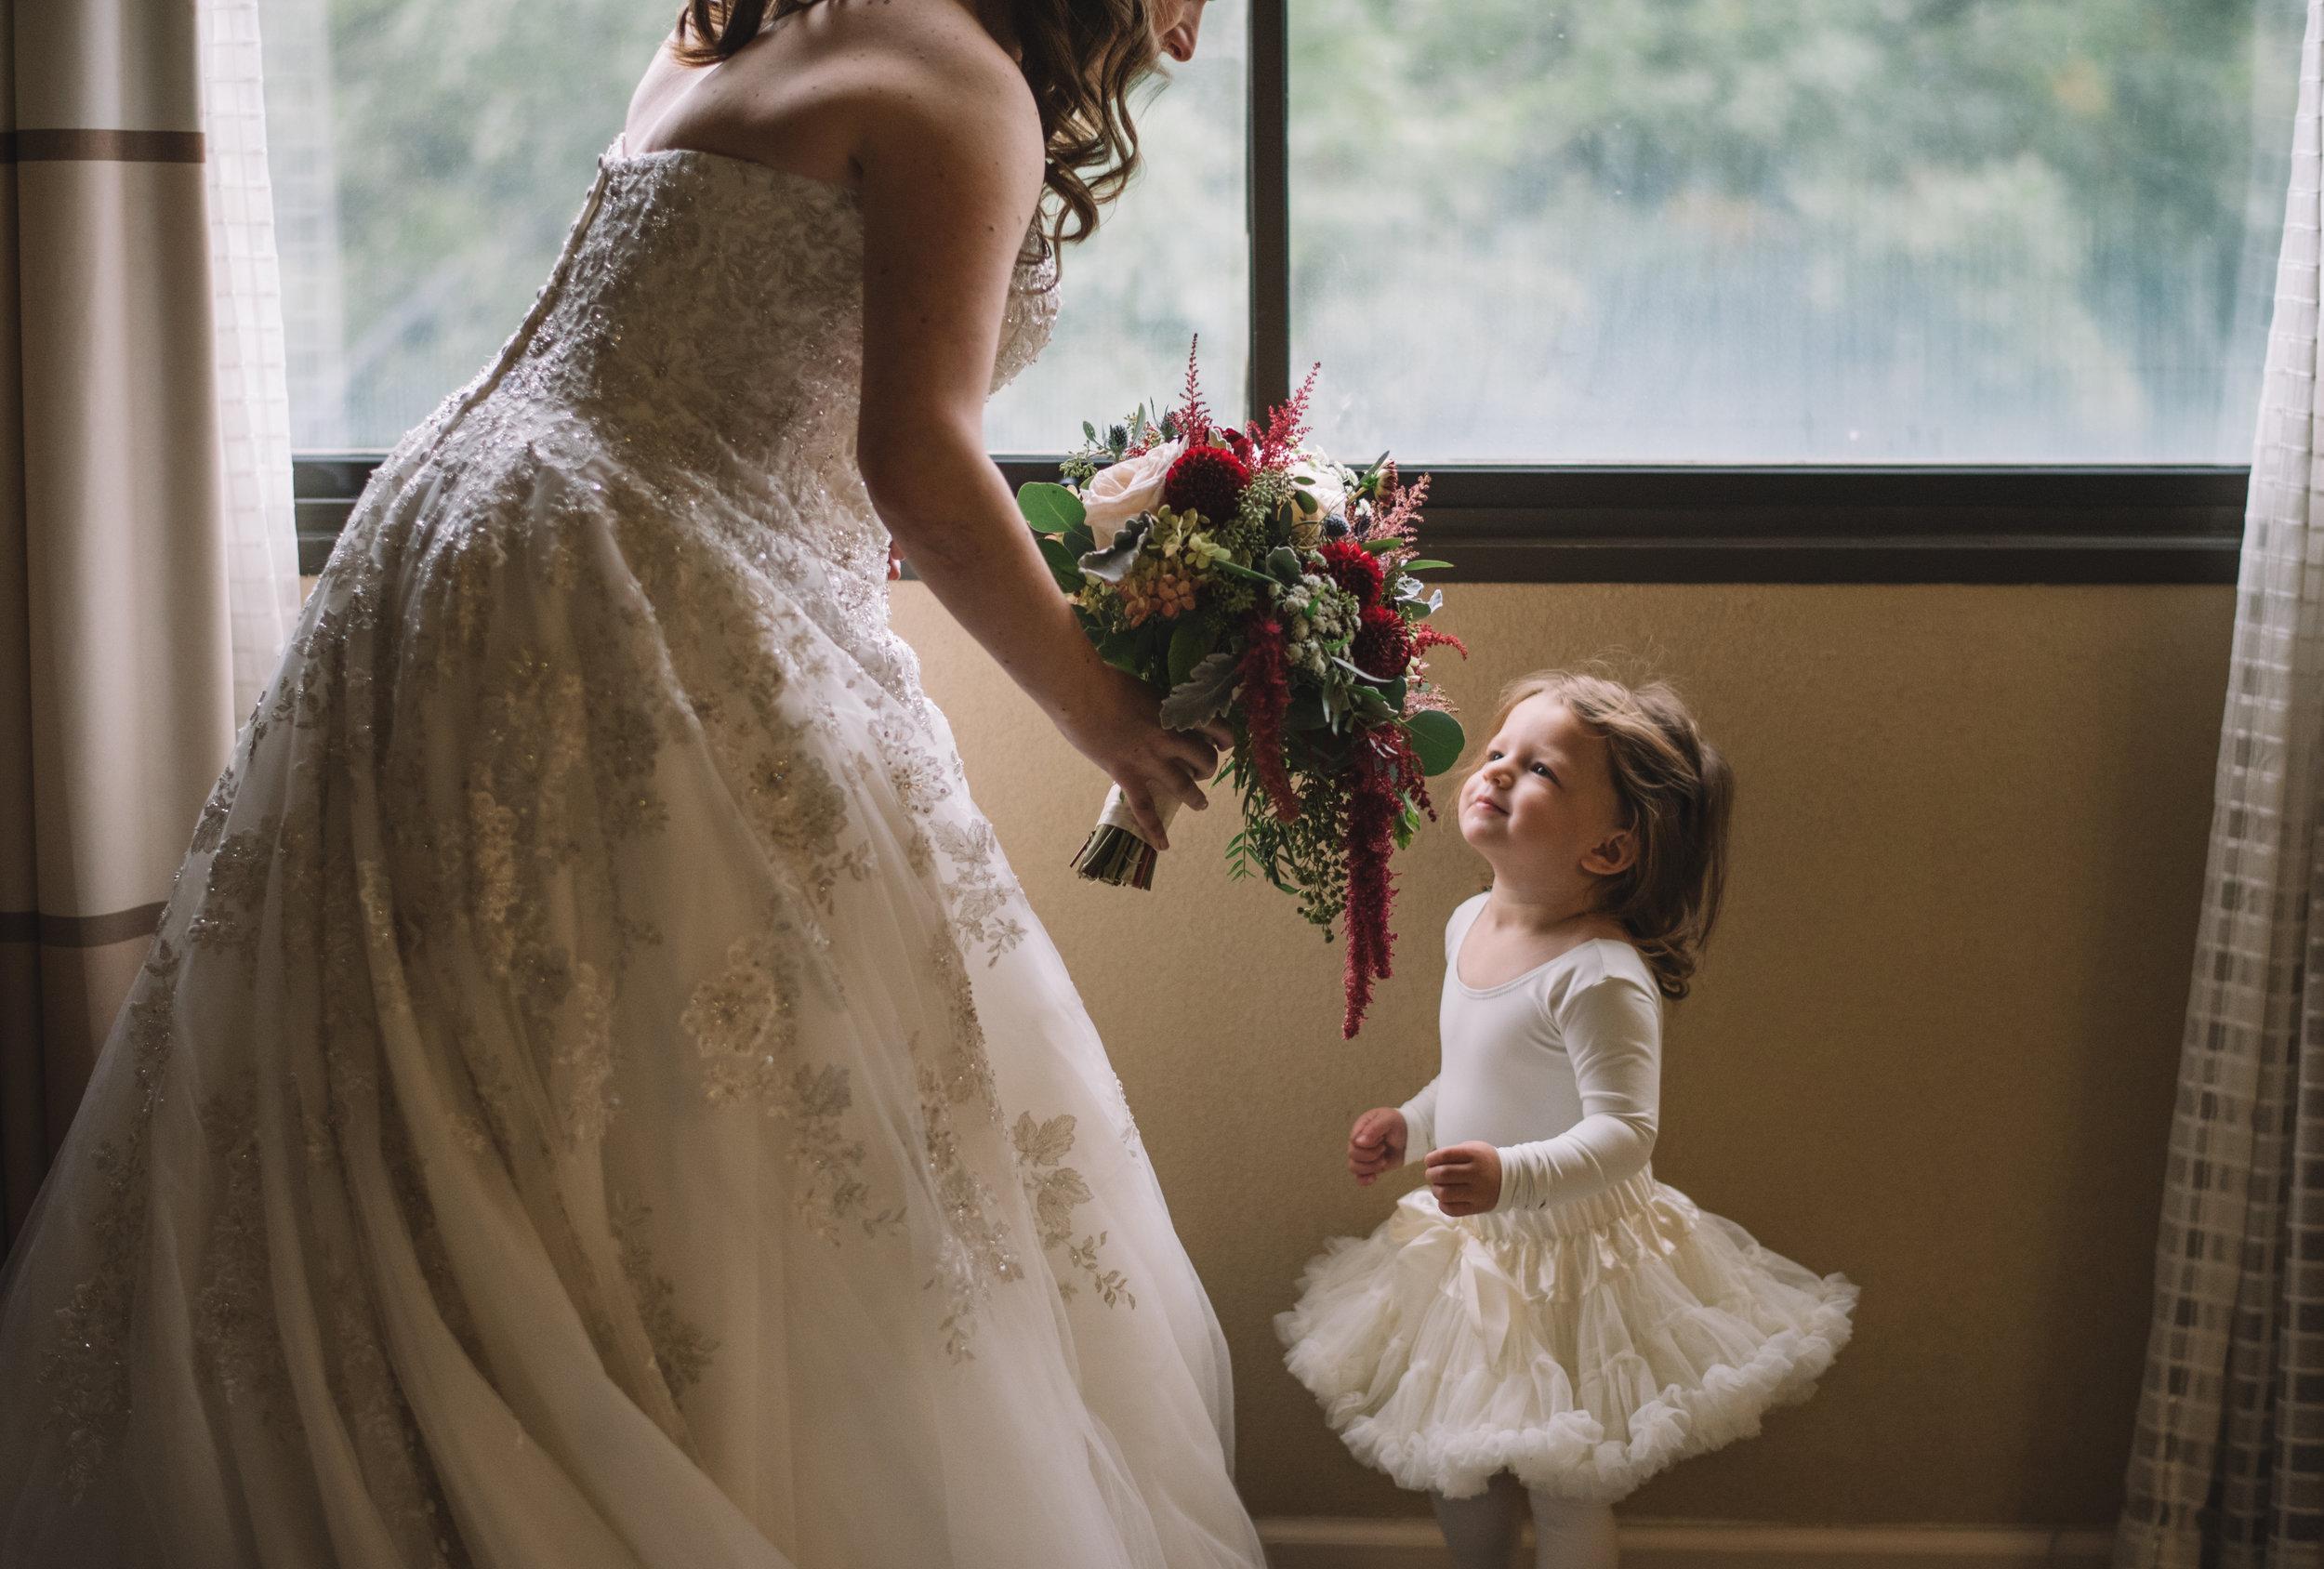 WeddingPhotos | NJPhotographer | Highlights-3-43.jpg